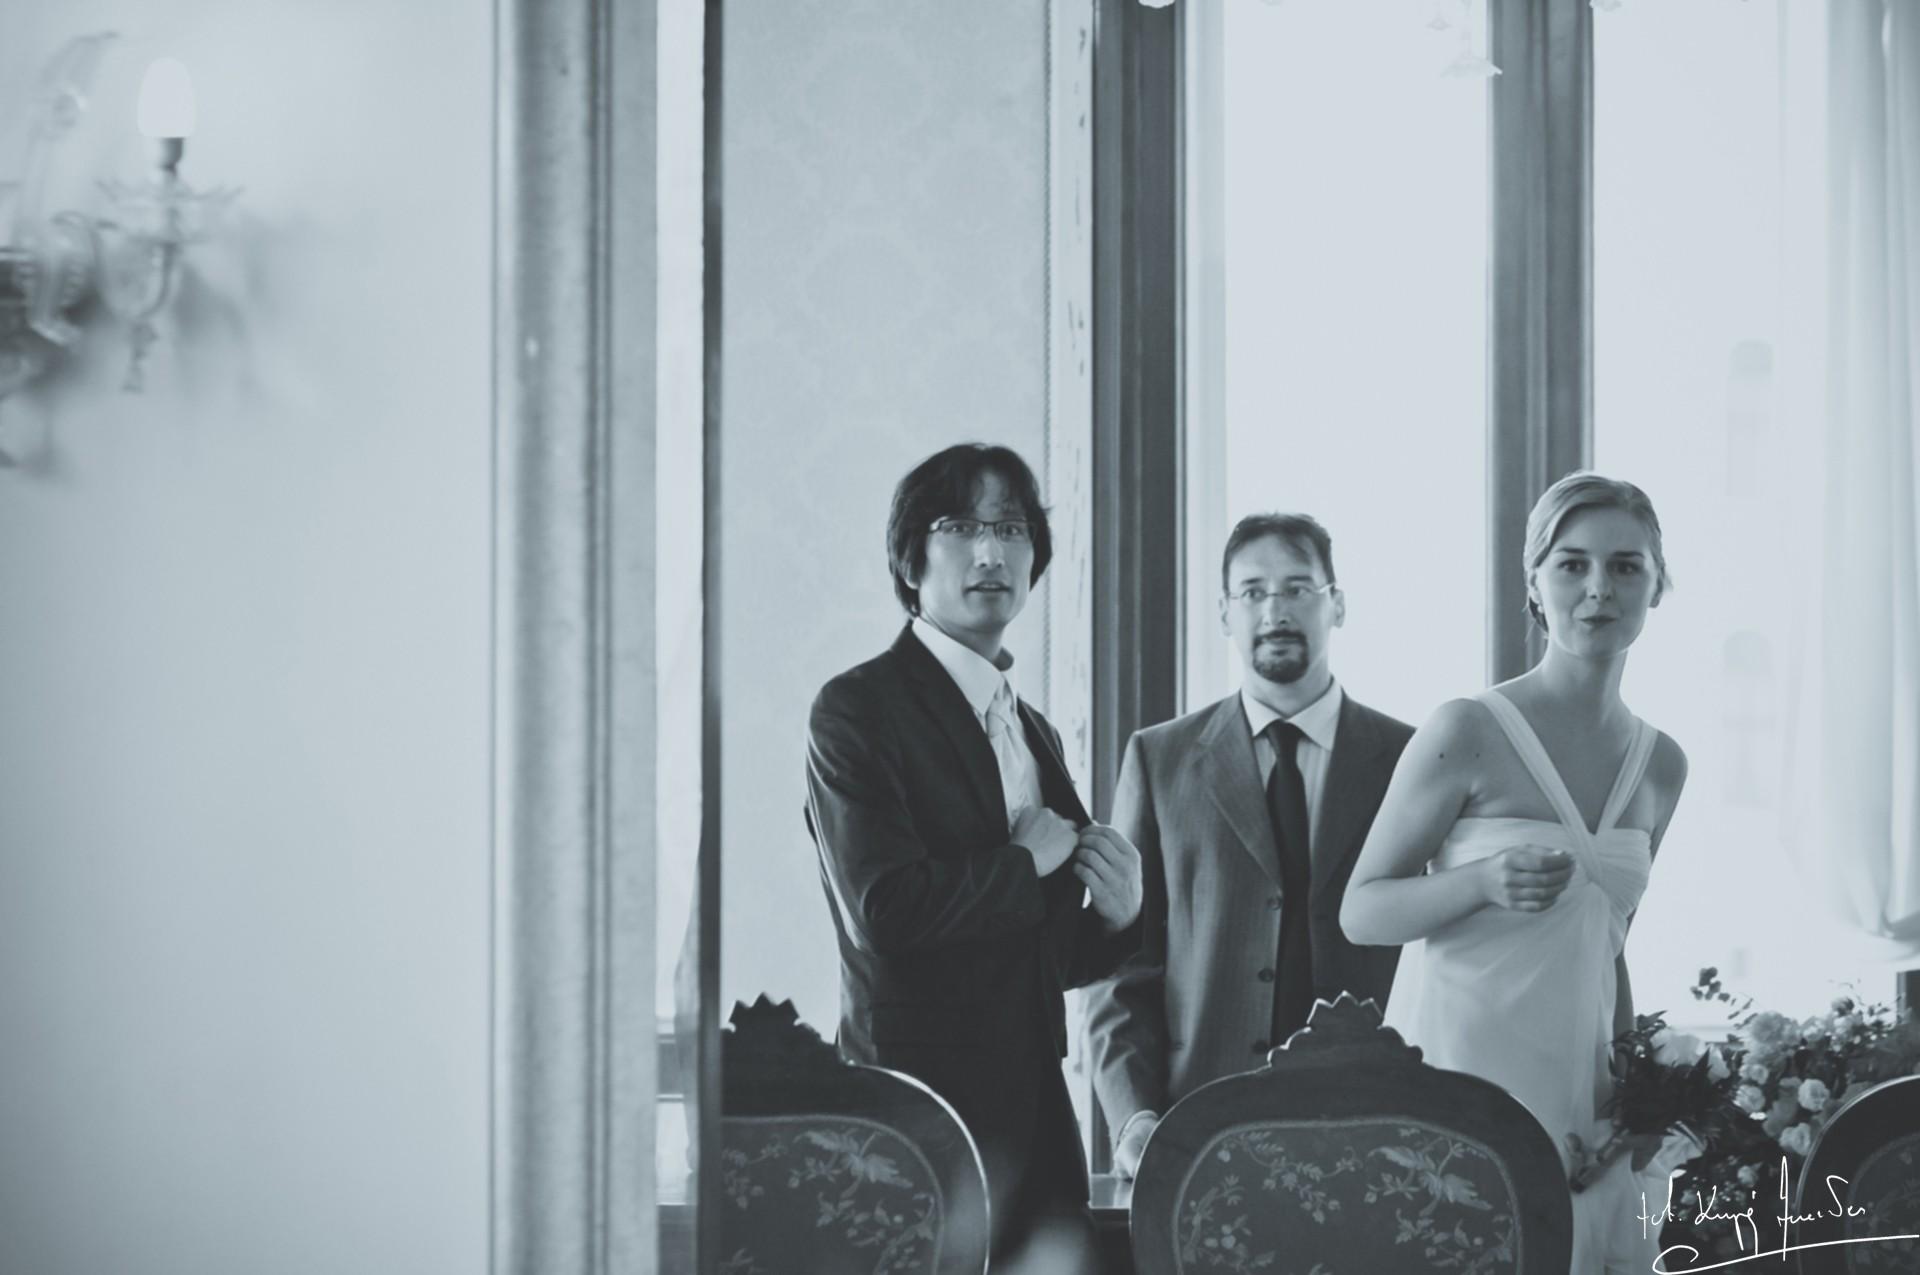 Ślub w wenecji 15 Manuela Luiza & Young Seon Song